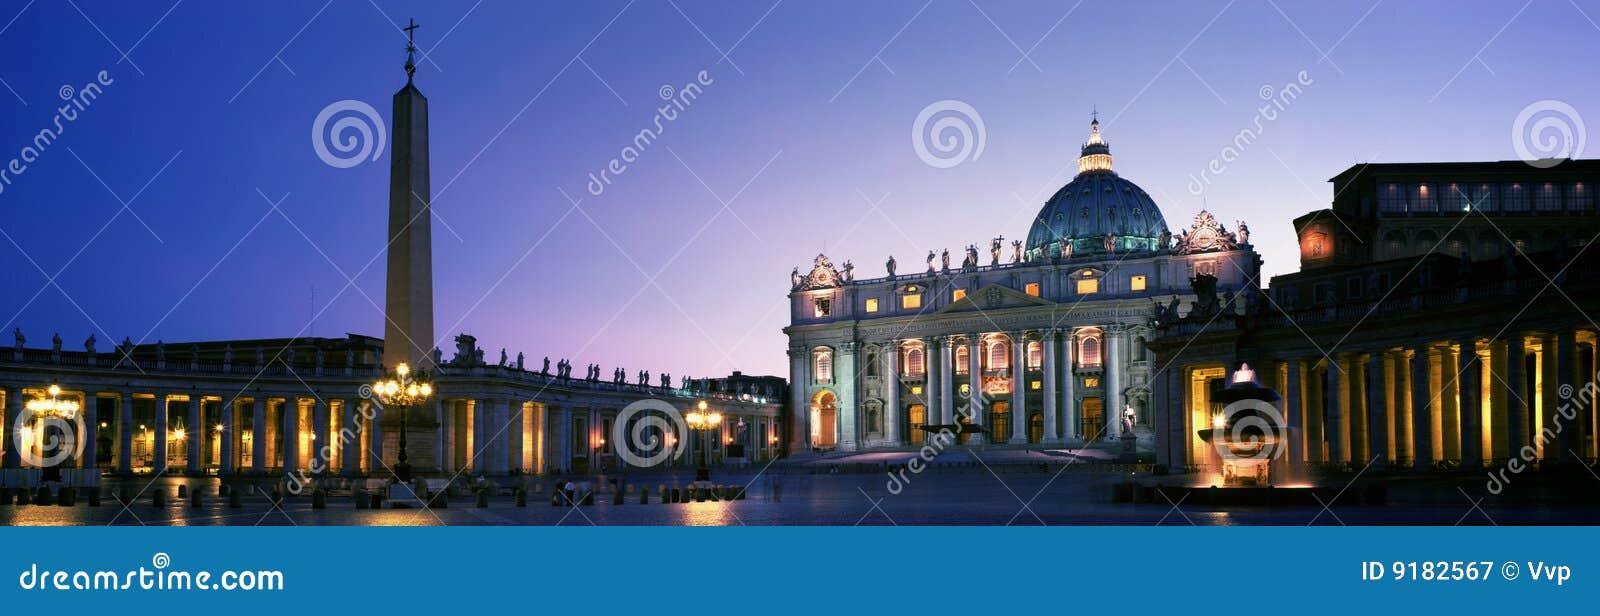 Ciudad del Vaticano, Roma, Italia